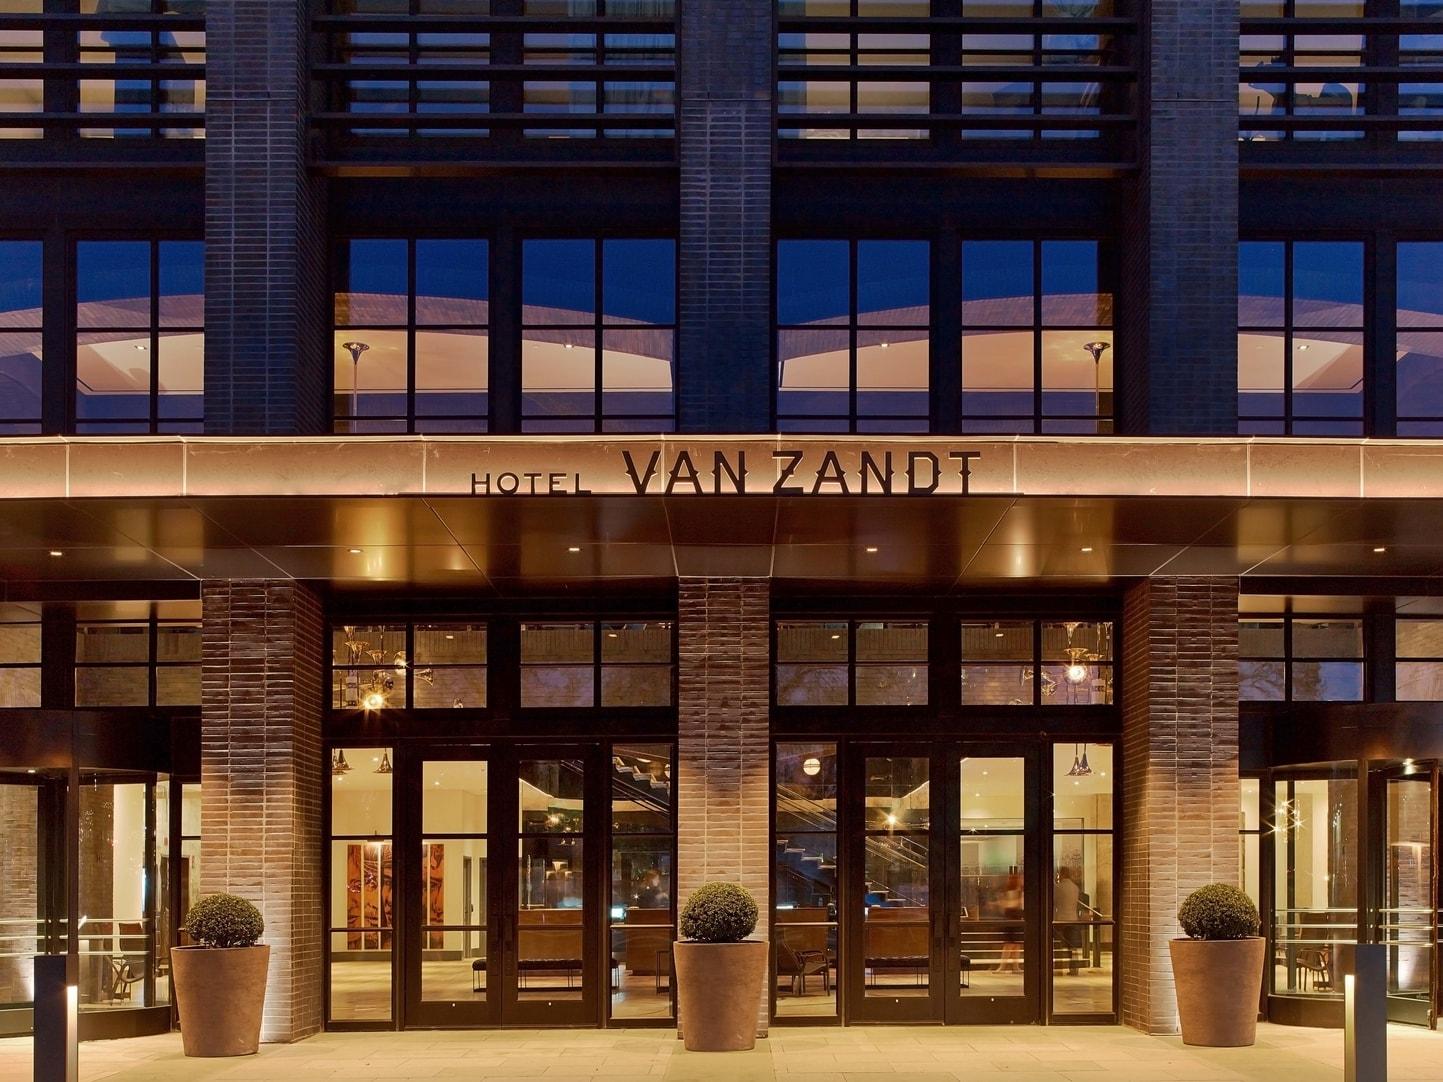 Van Zandt Hotel Austin 2015.jpg